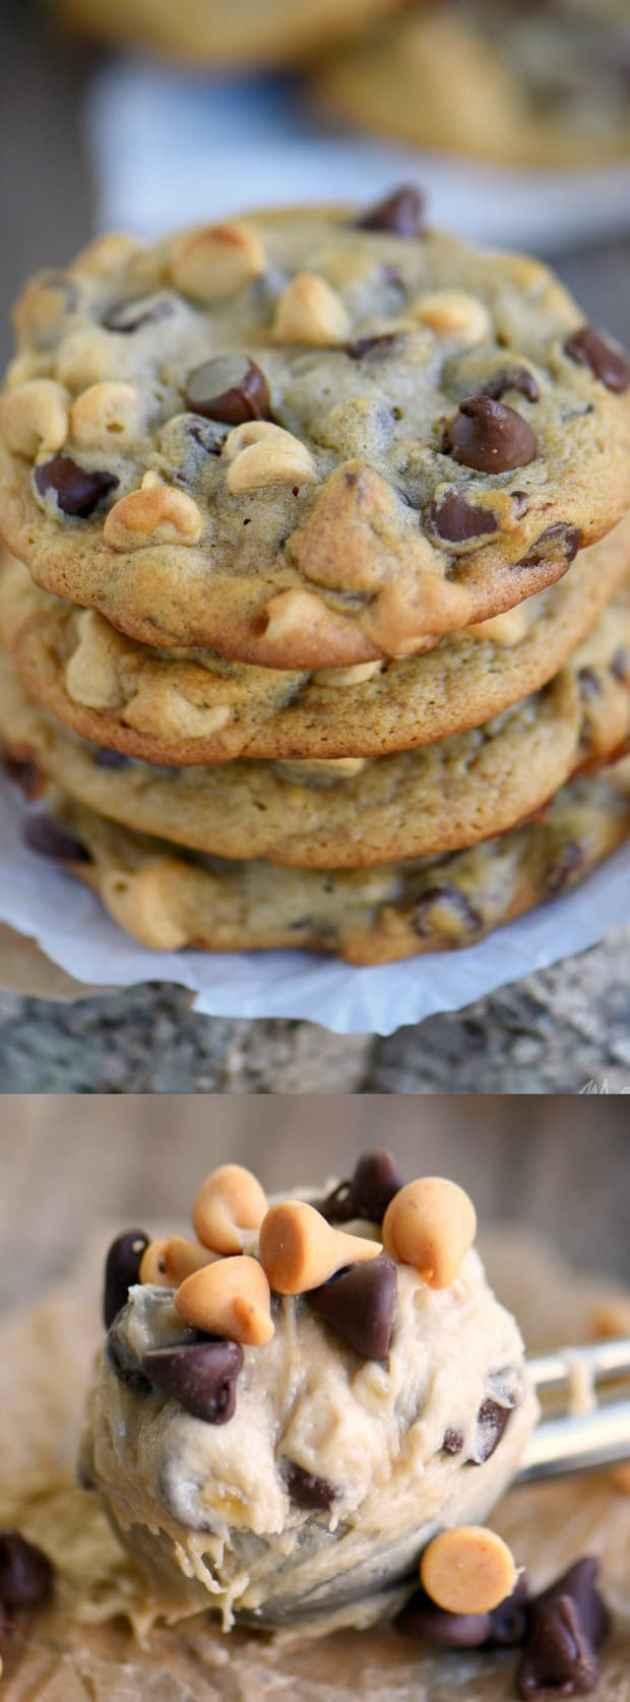 Peanut Butter Banana Chocolate Chip cookies longpin